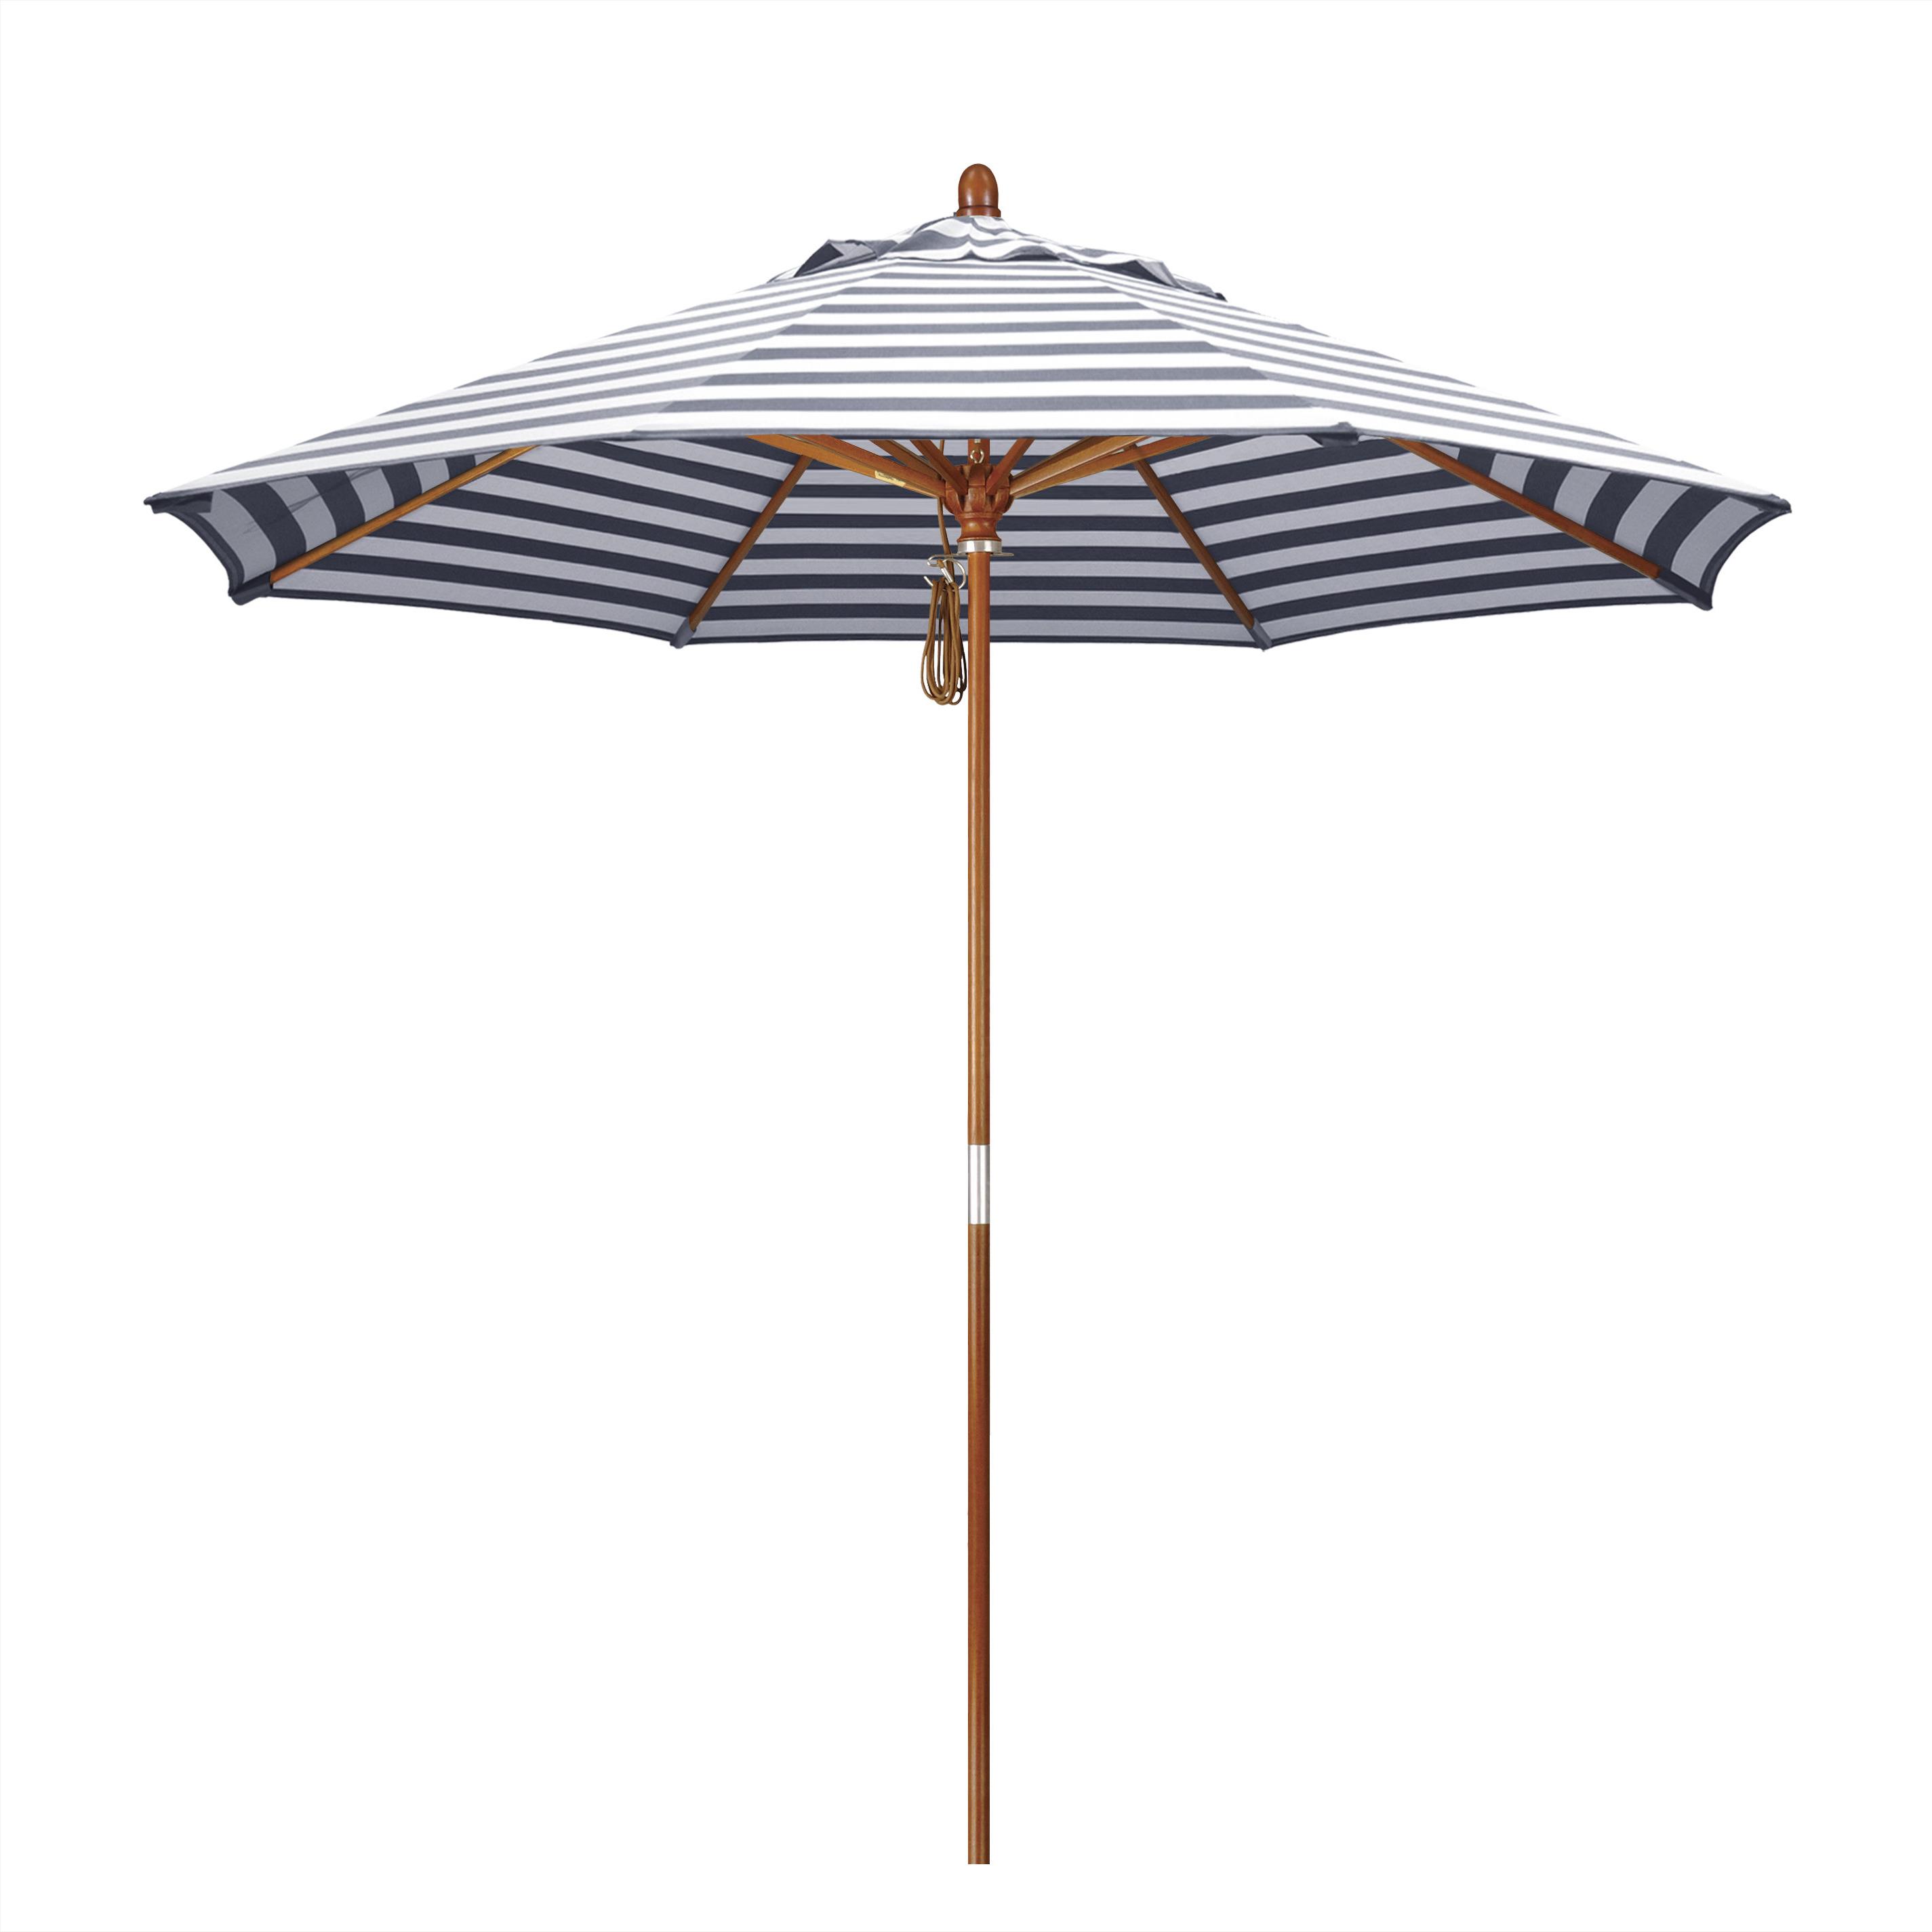 Fleetwood Market Umbrellas Pertaining To Most Recent Mare 9' Market Umbrella (View 15 of 20)